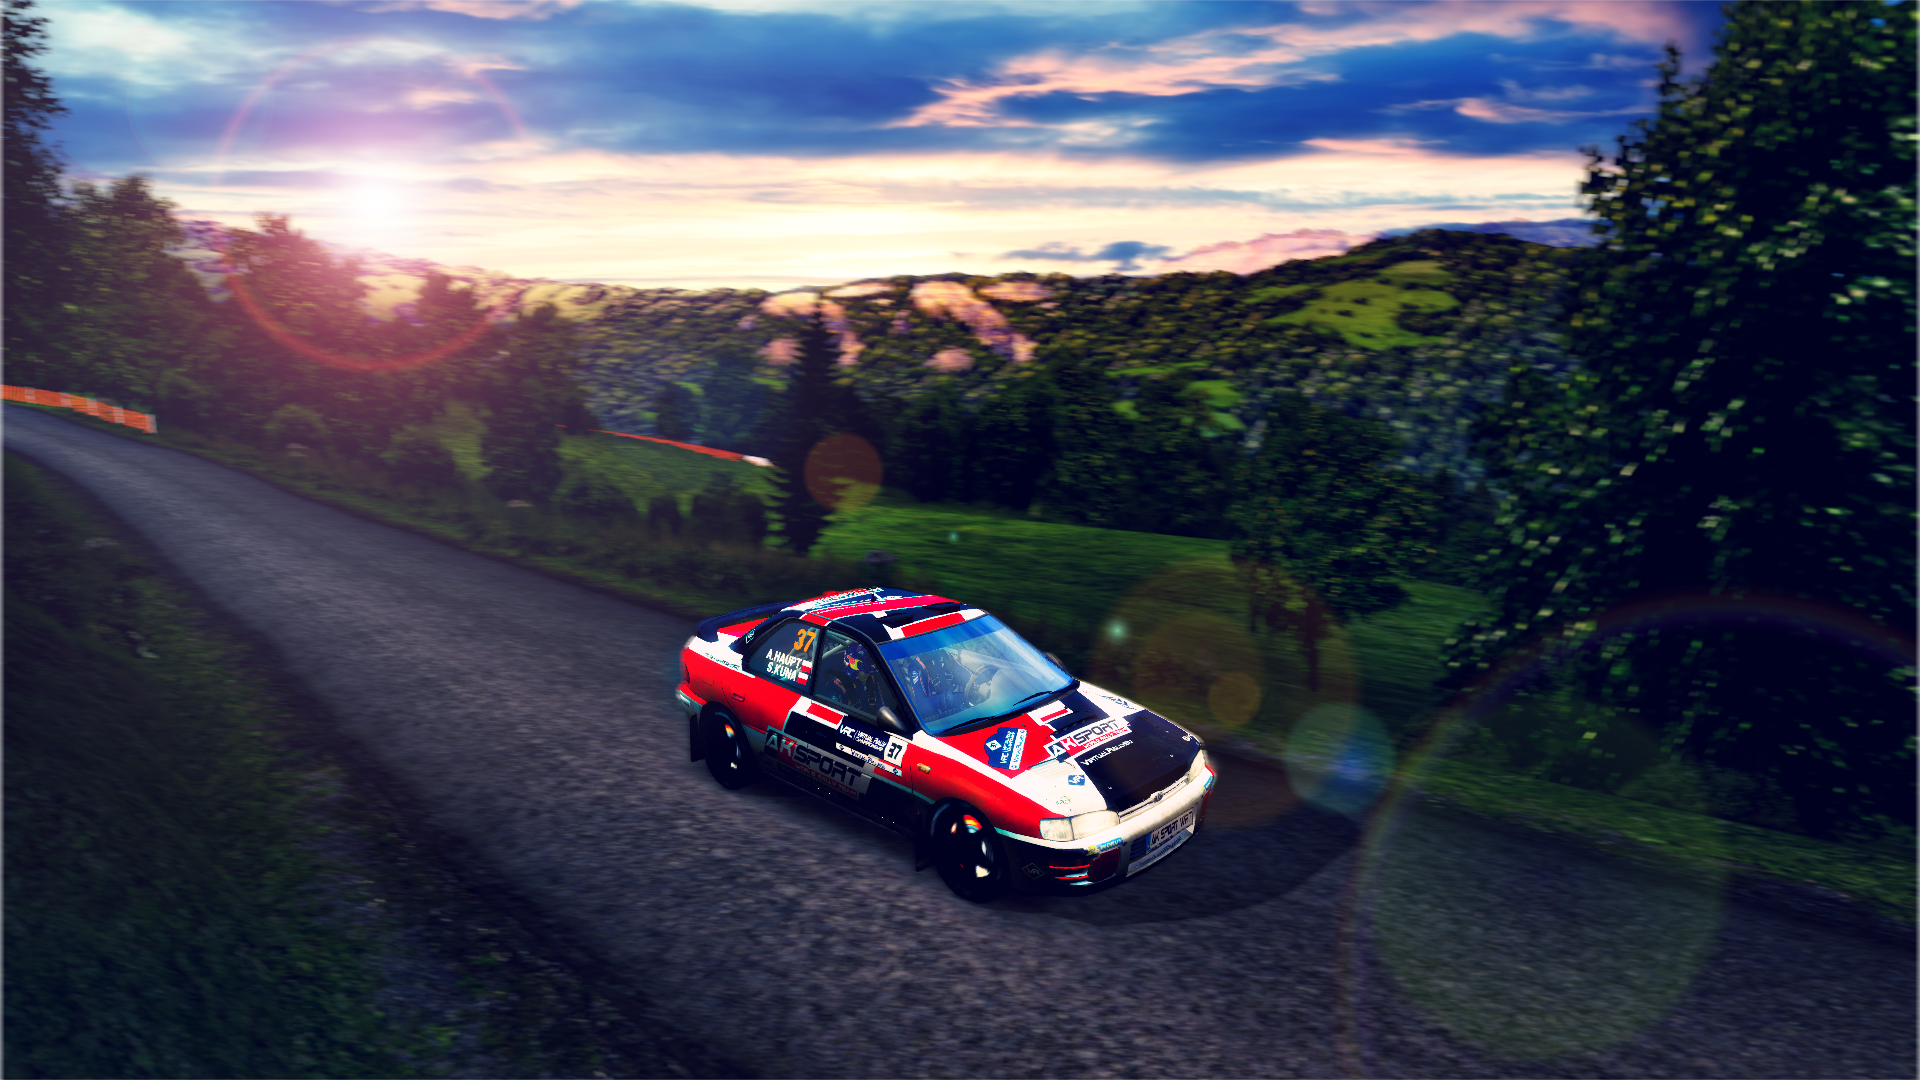 richard-burns-rally-screenshot-2021-02-15-18-06-47-41